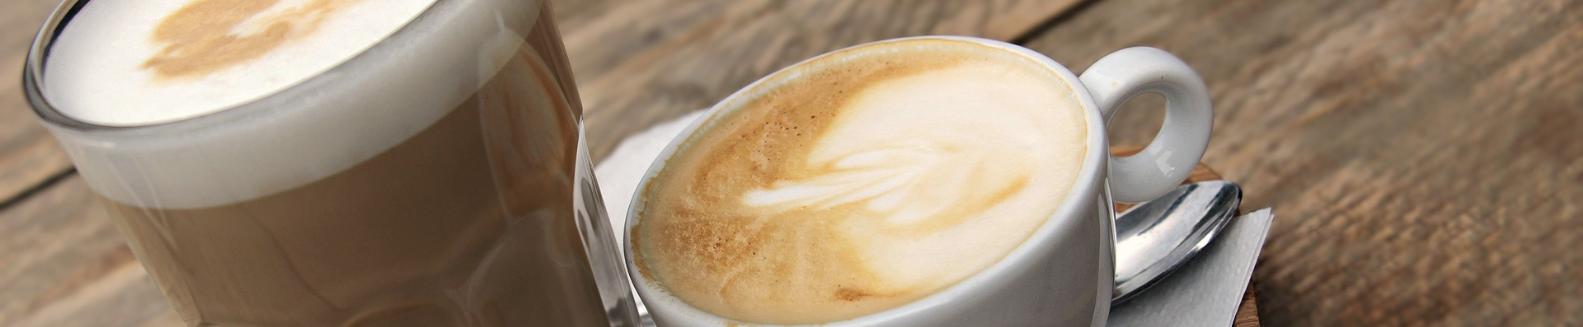 Invitation:Coffee lucky dip